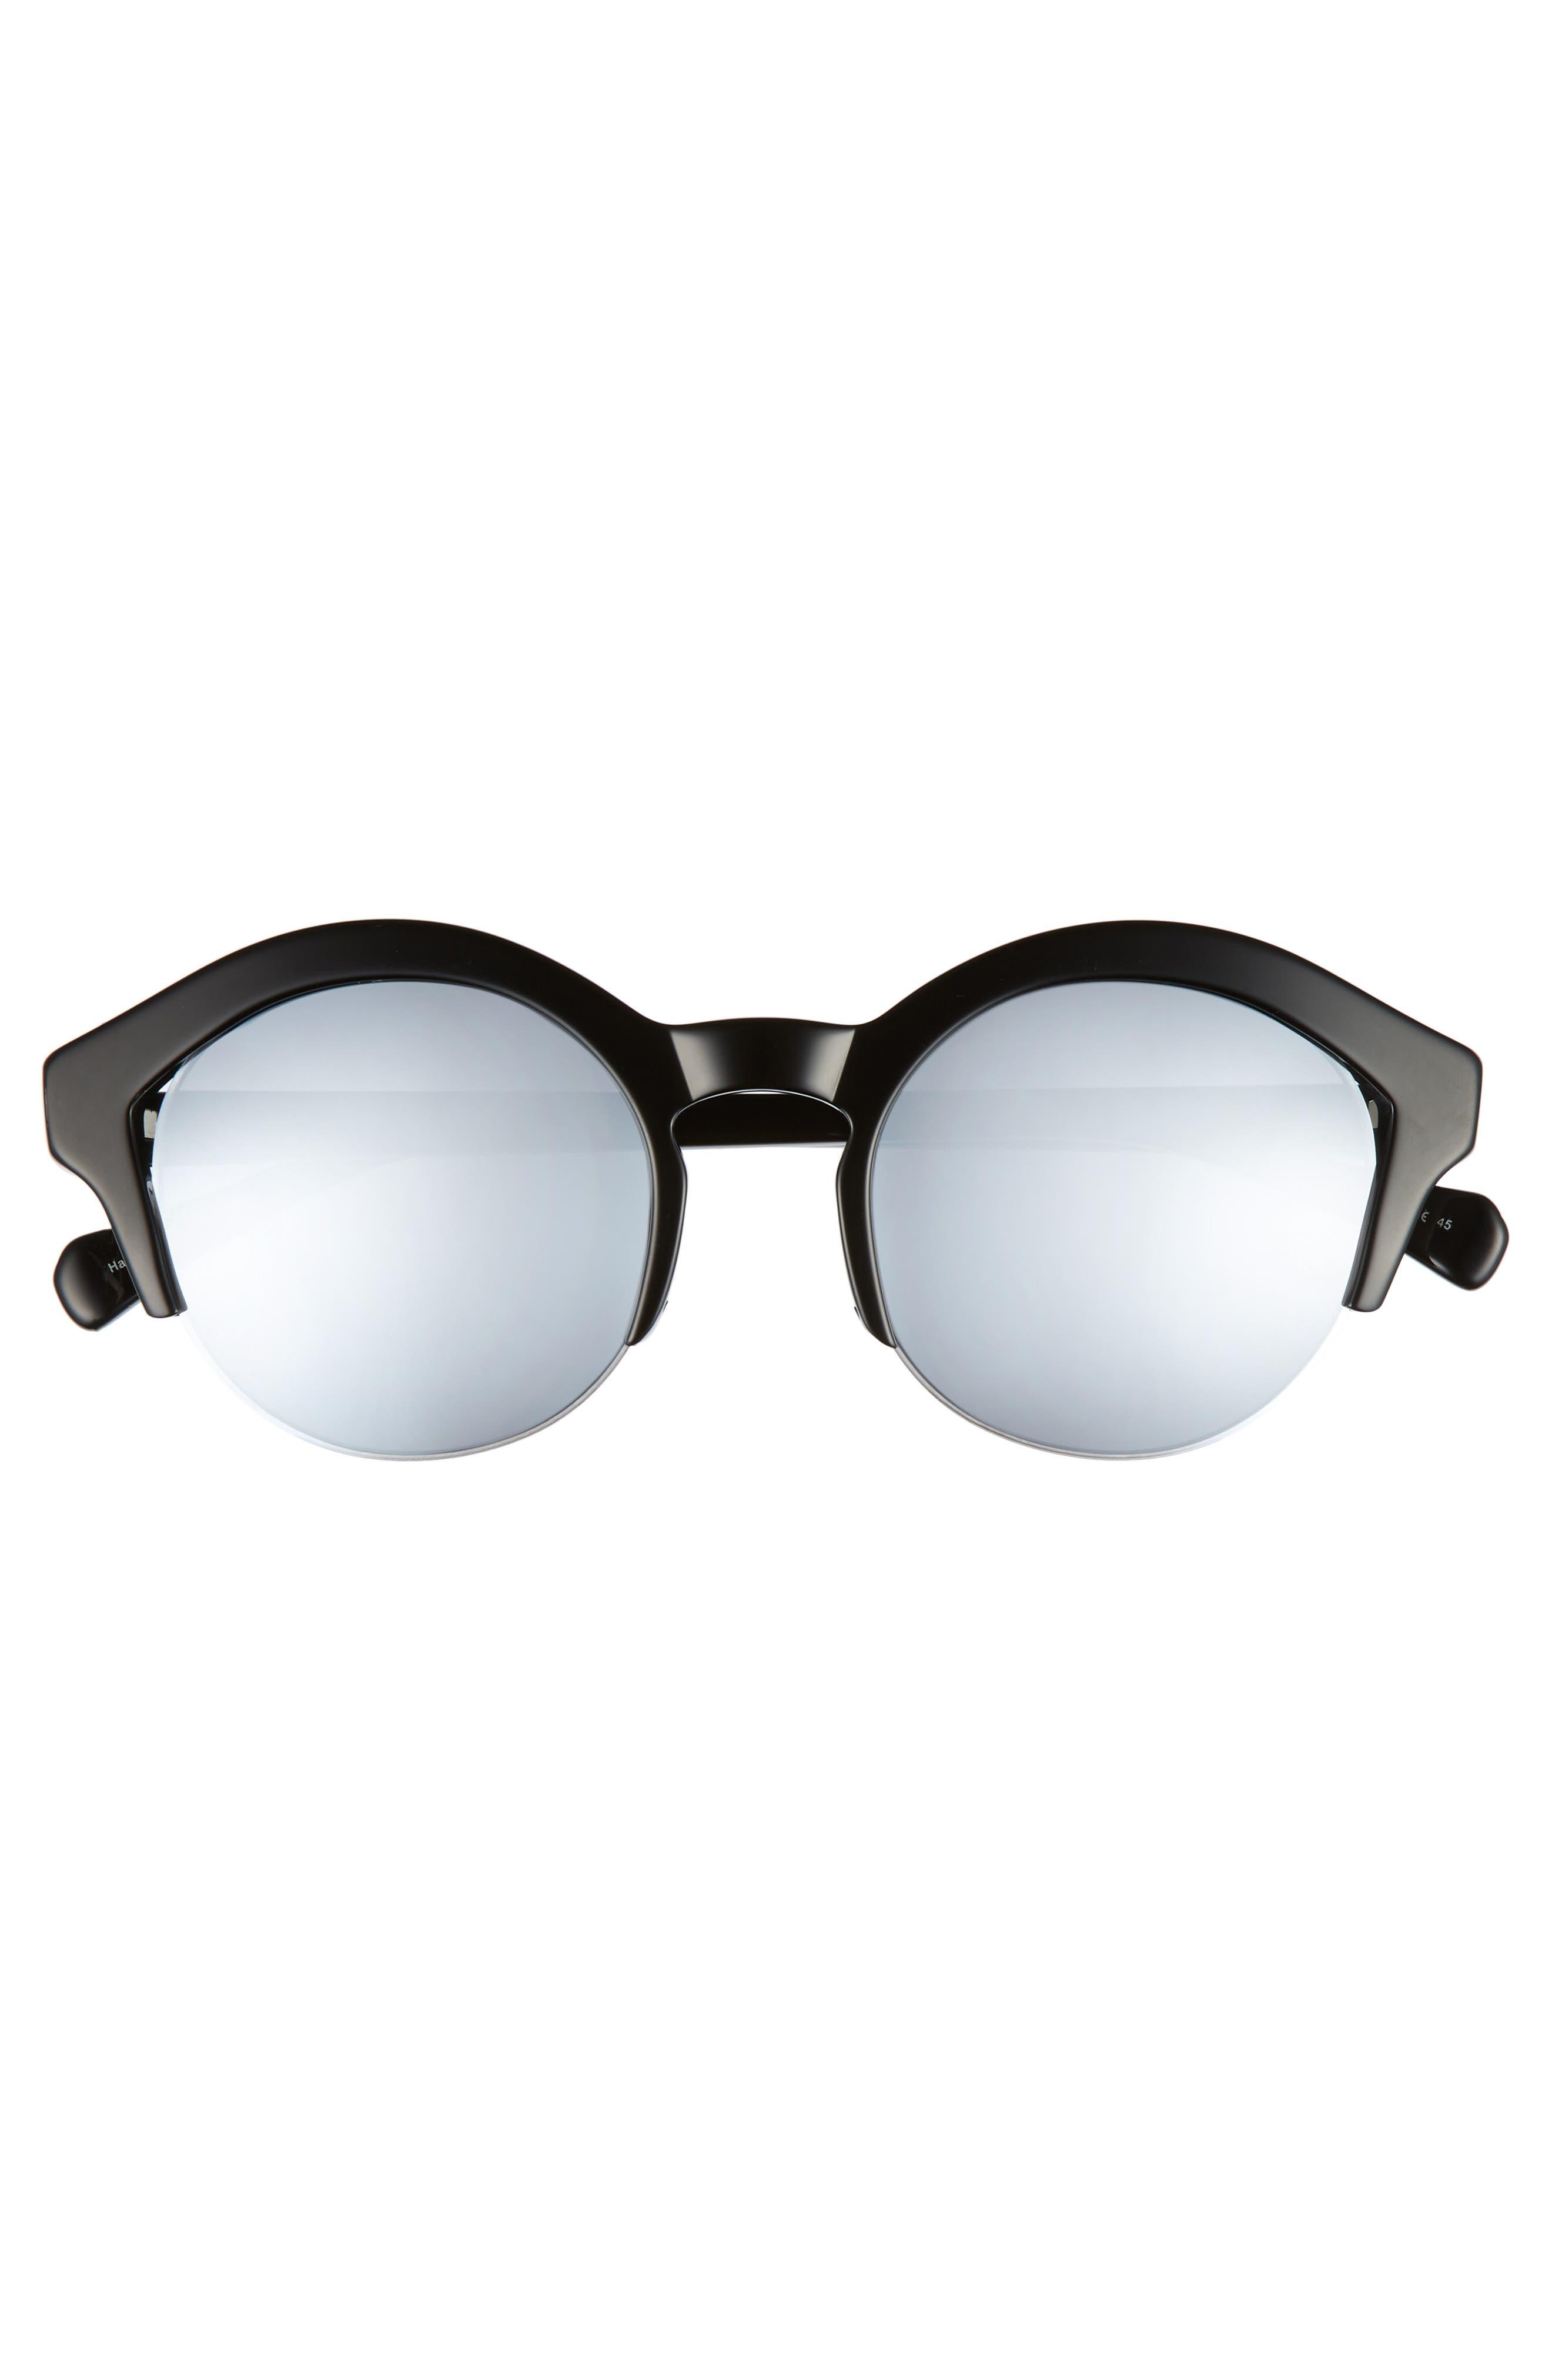 Bren 51mm Half-Rim Sunglasses,                             Alternate thumbnail 3, color,                             BLACK/ SILVER